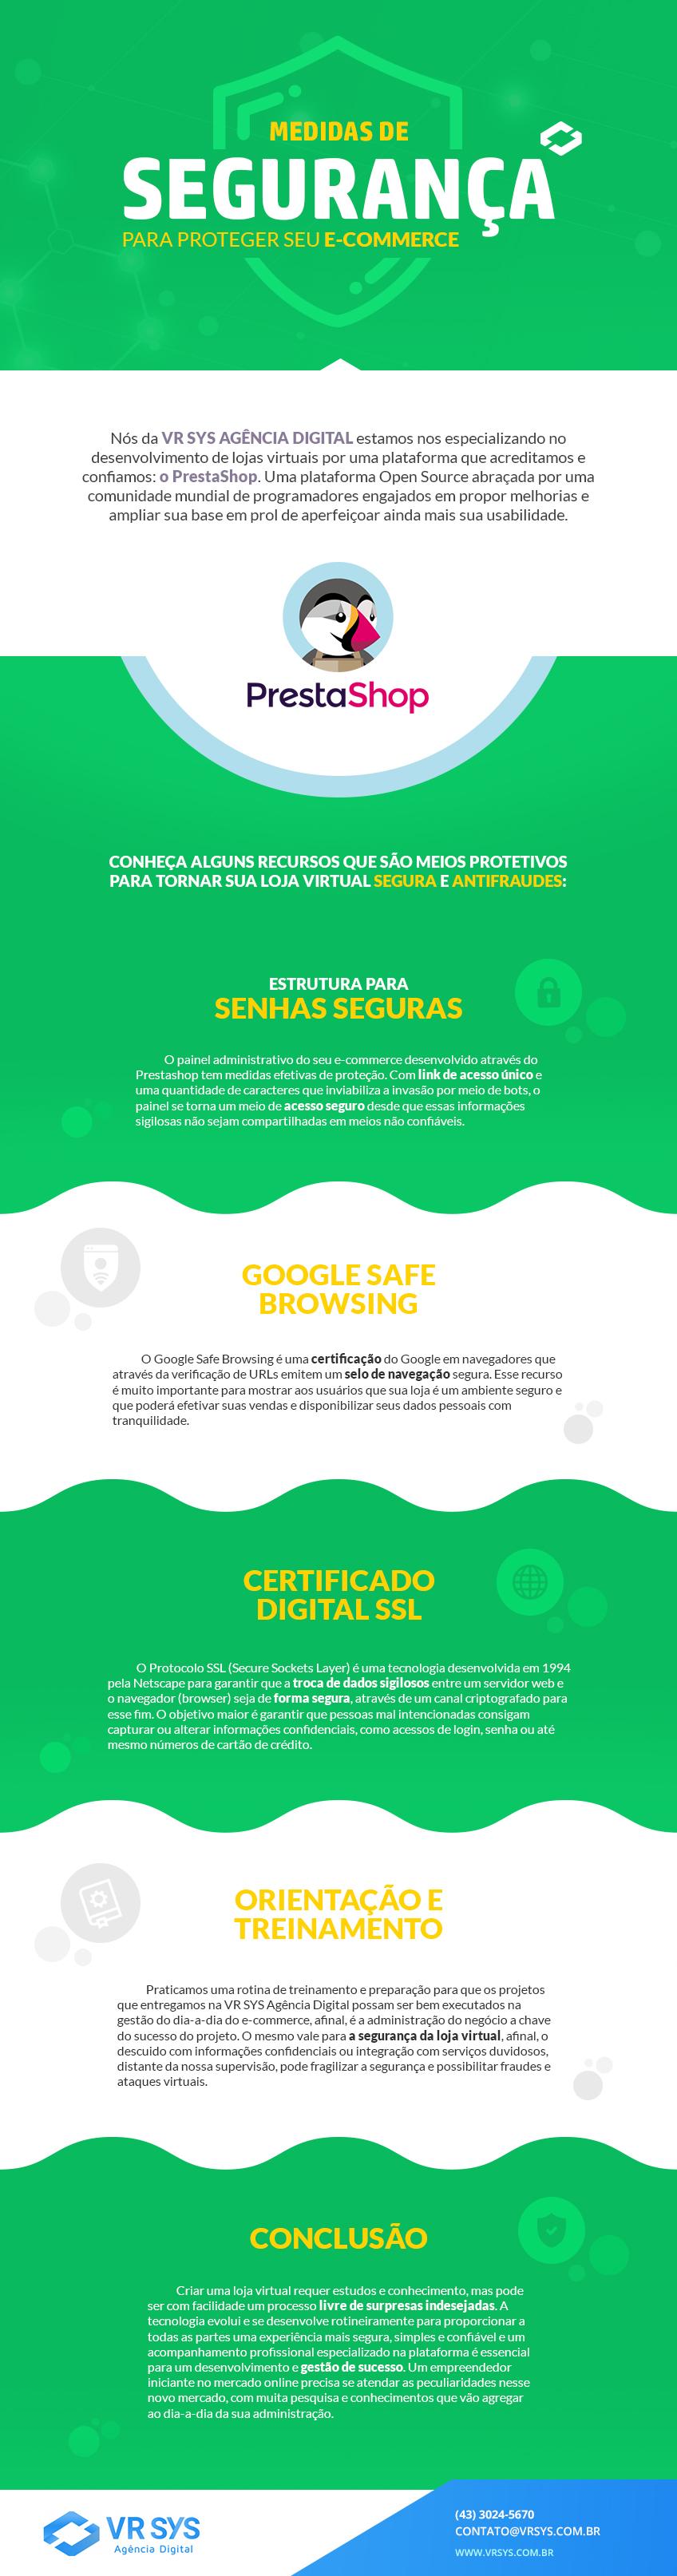 Medidas de segurança para proteger seu e-commerce